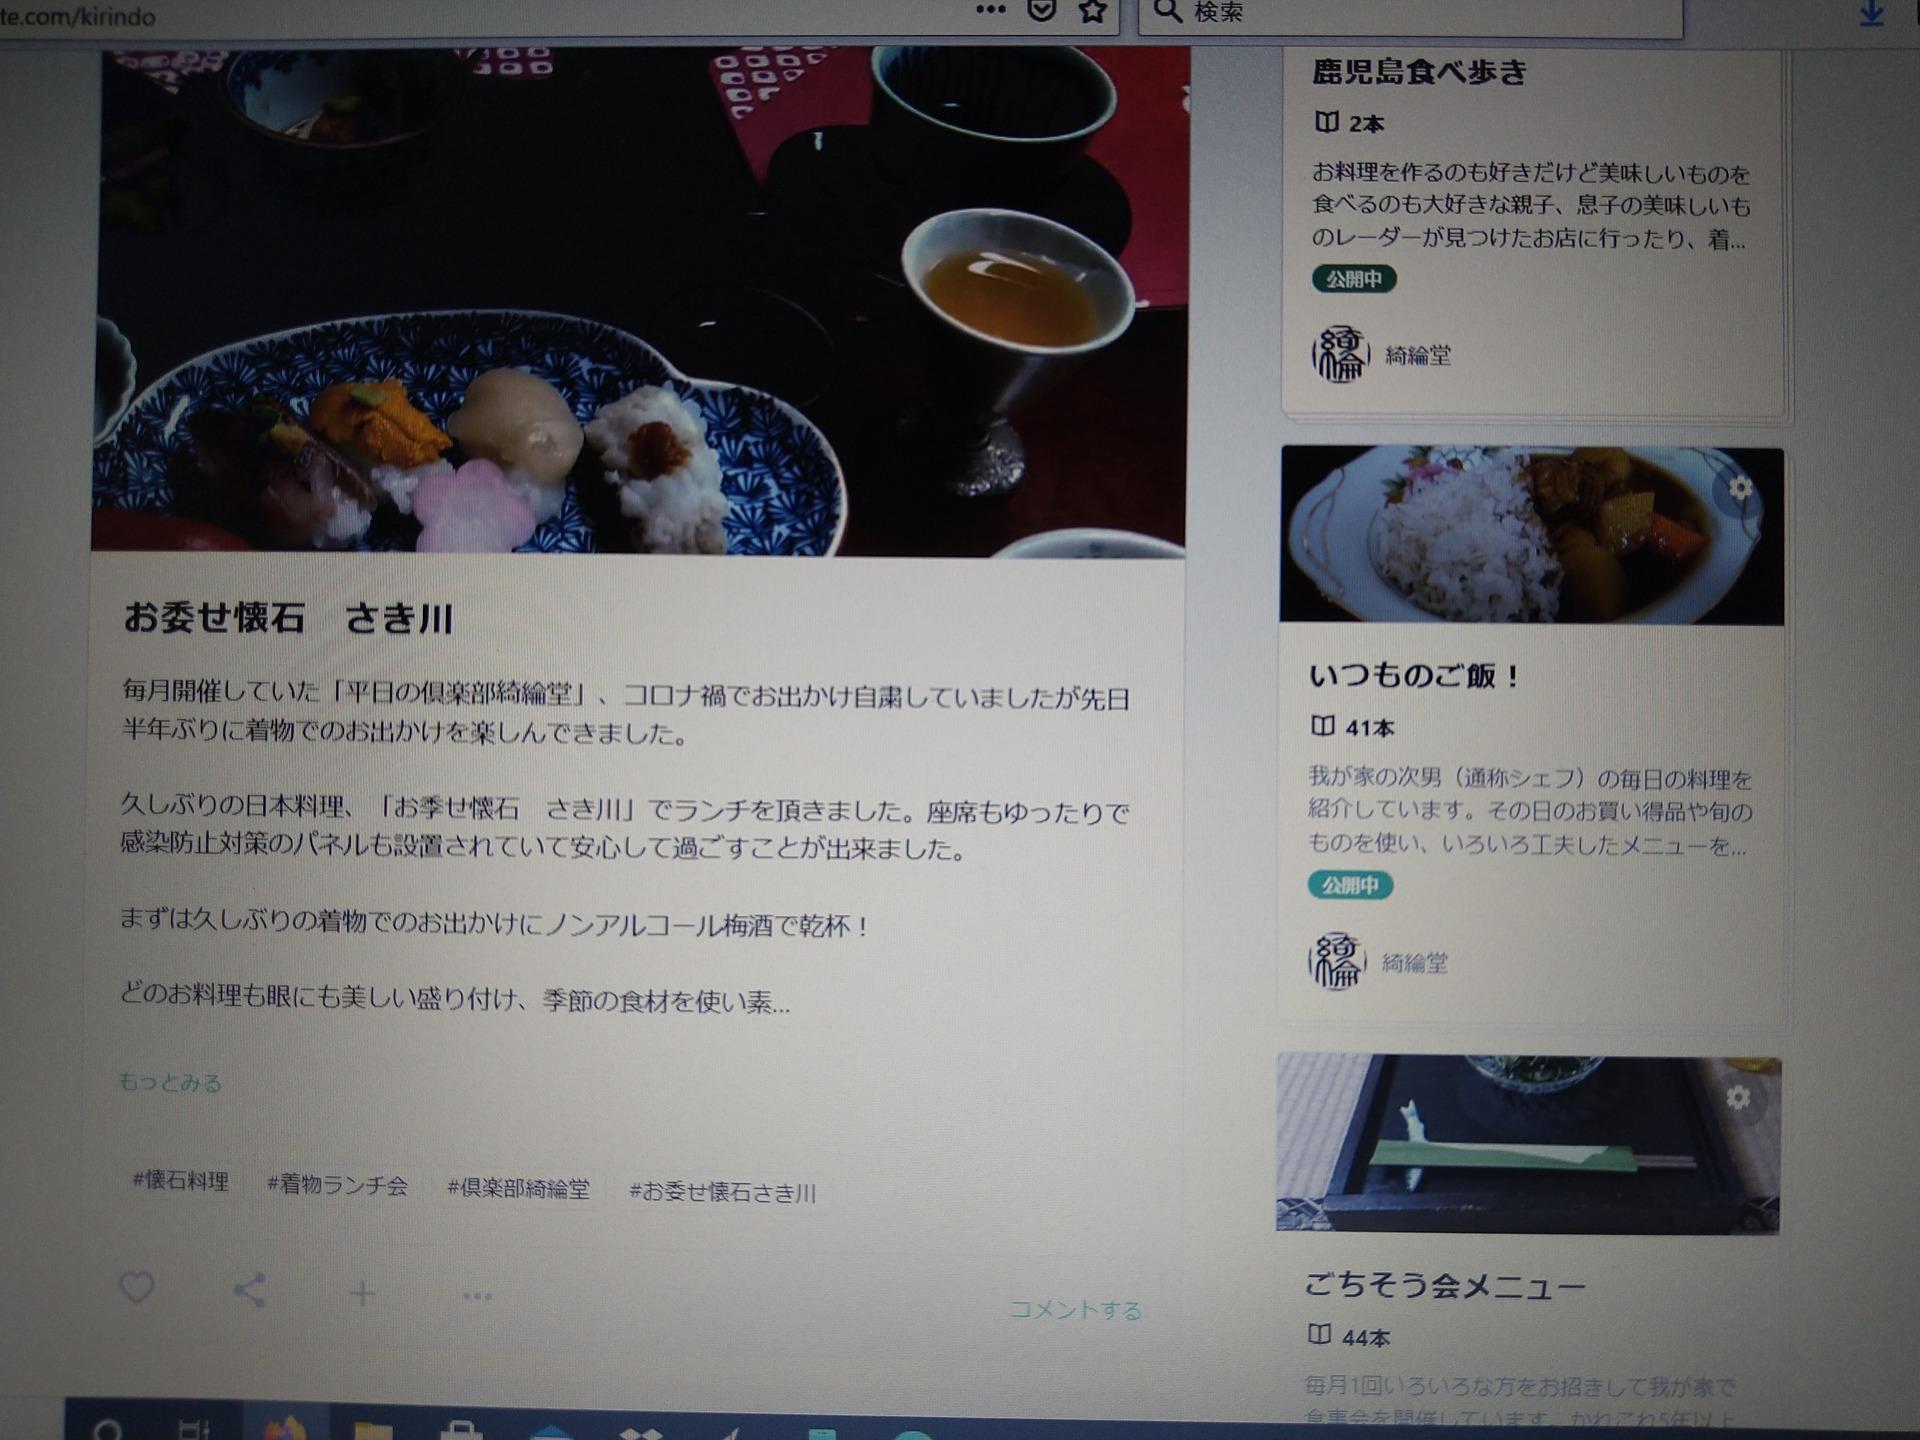 DSC_0577.JPG